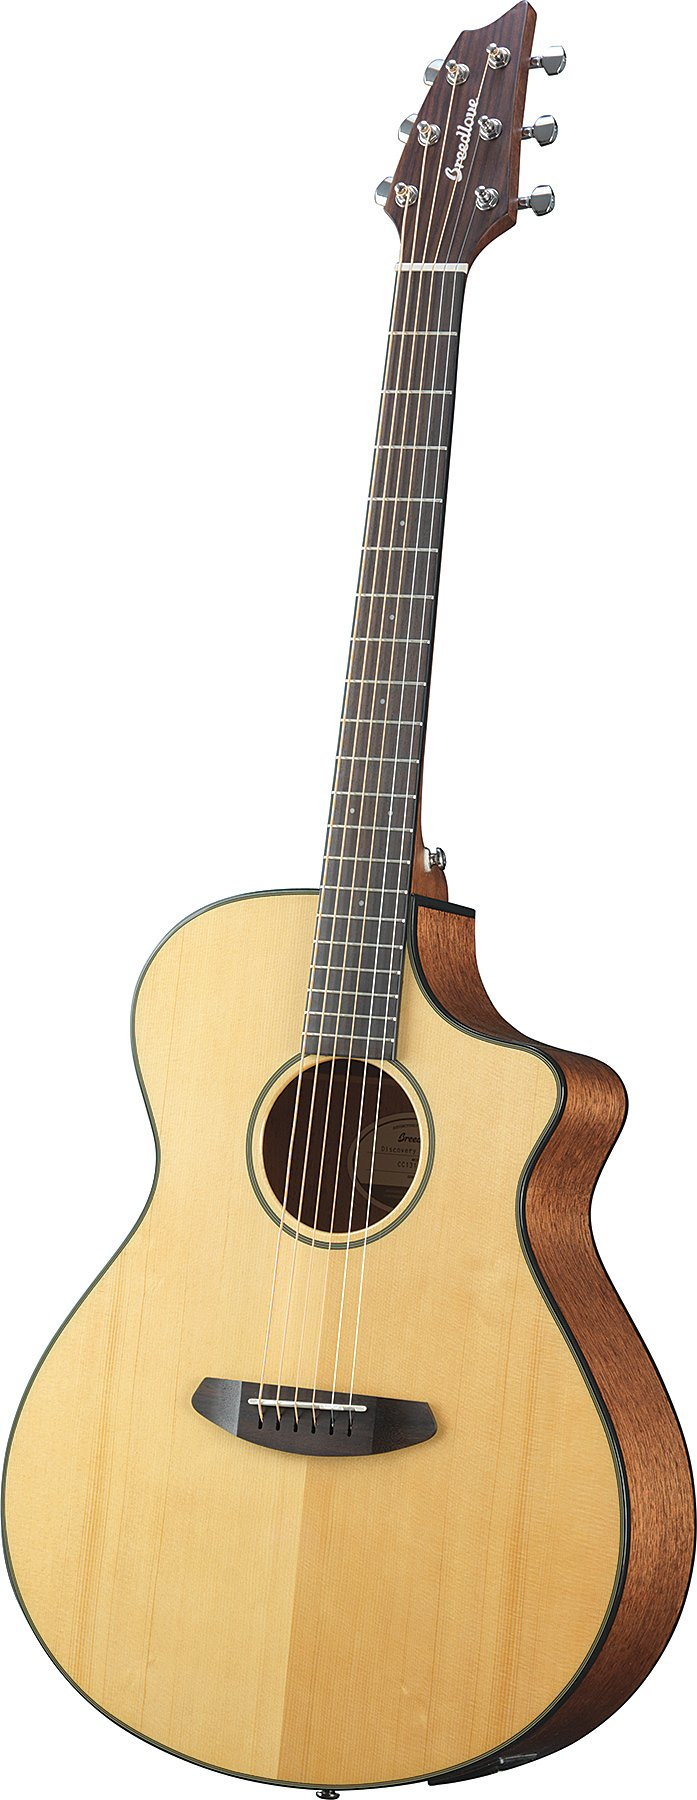 Acoustic-Cutaway Electric Guitar